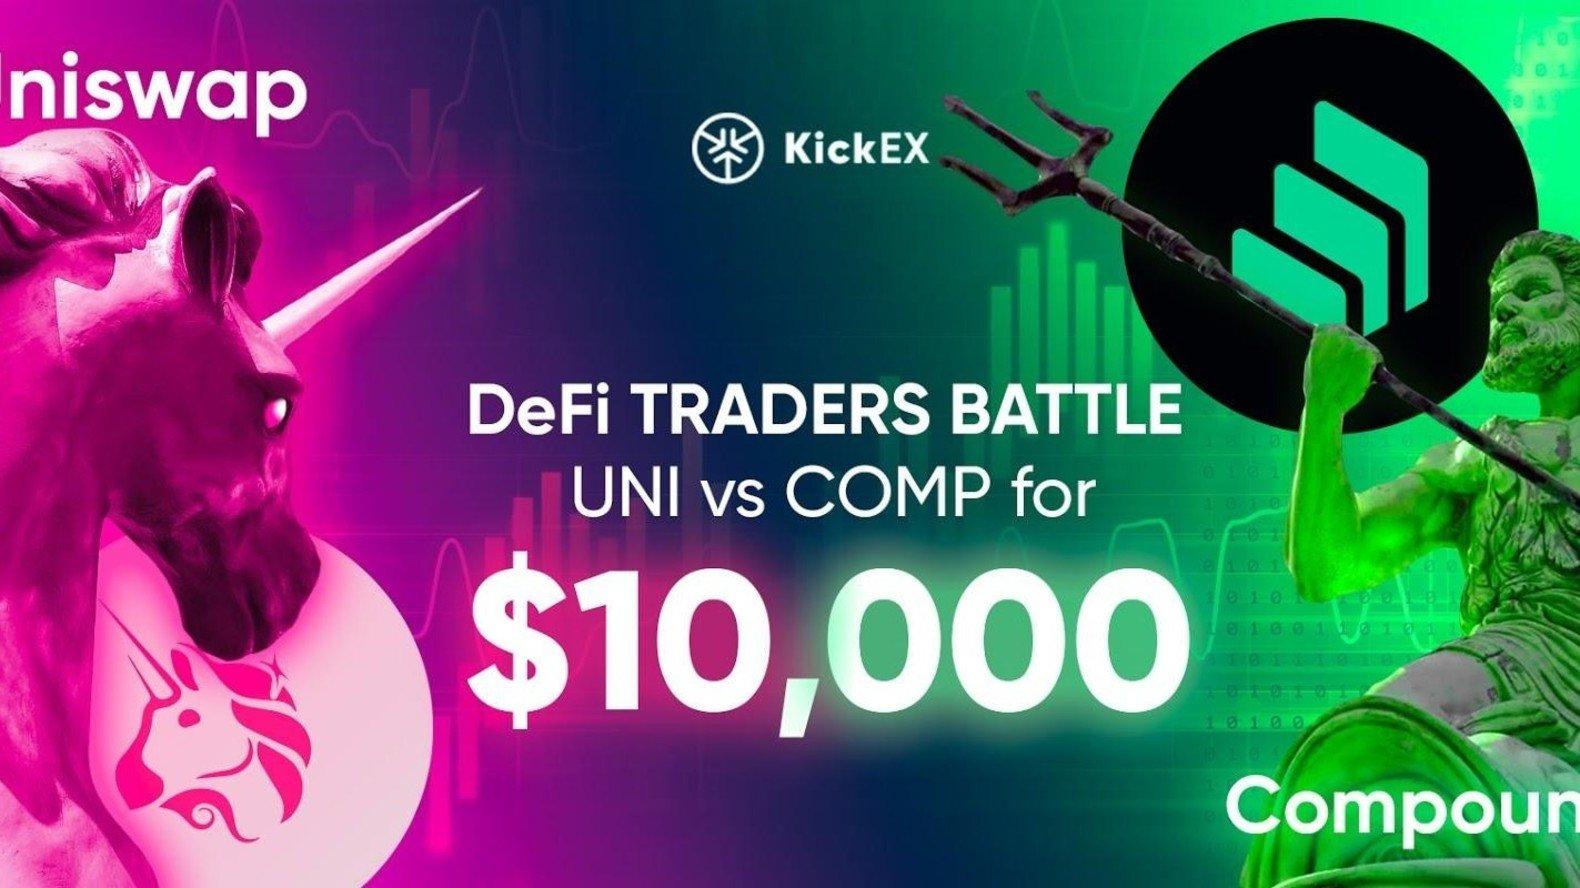 DeFi Traders争夺$ 10,000:UNI与COMP